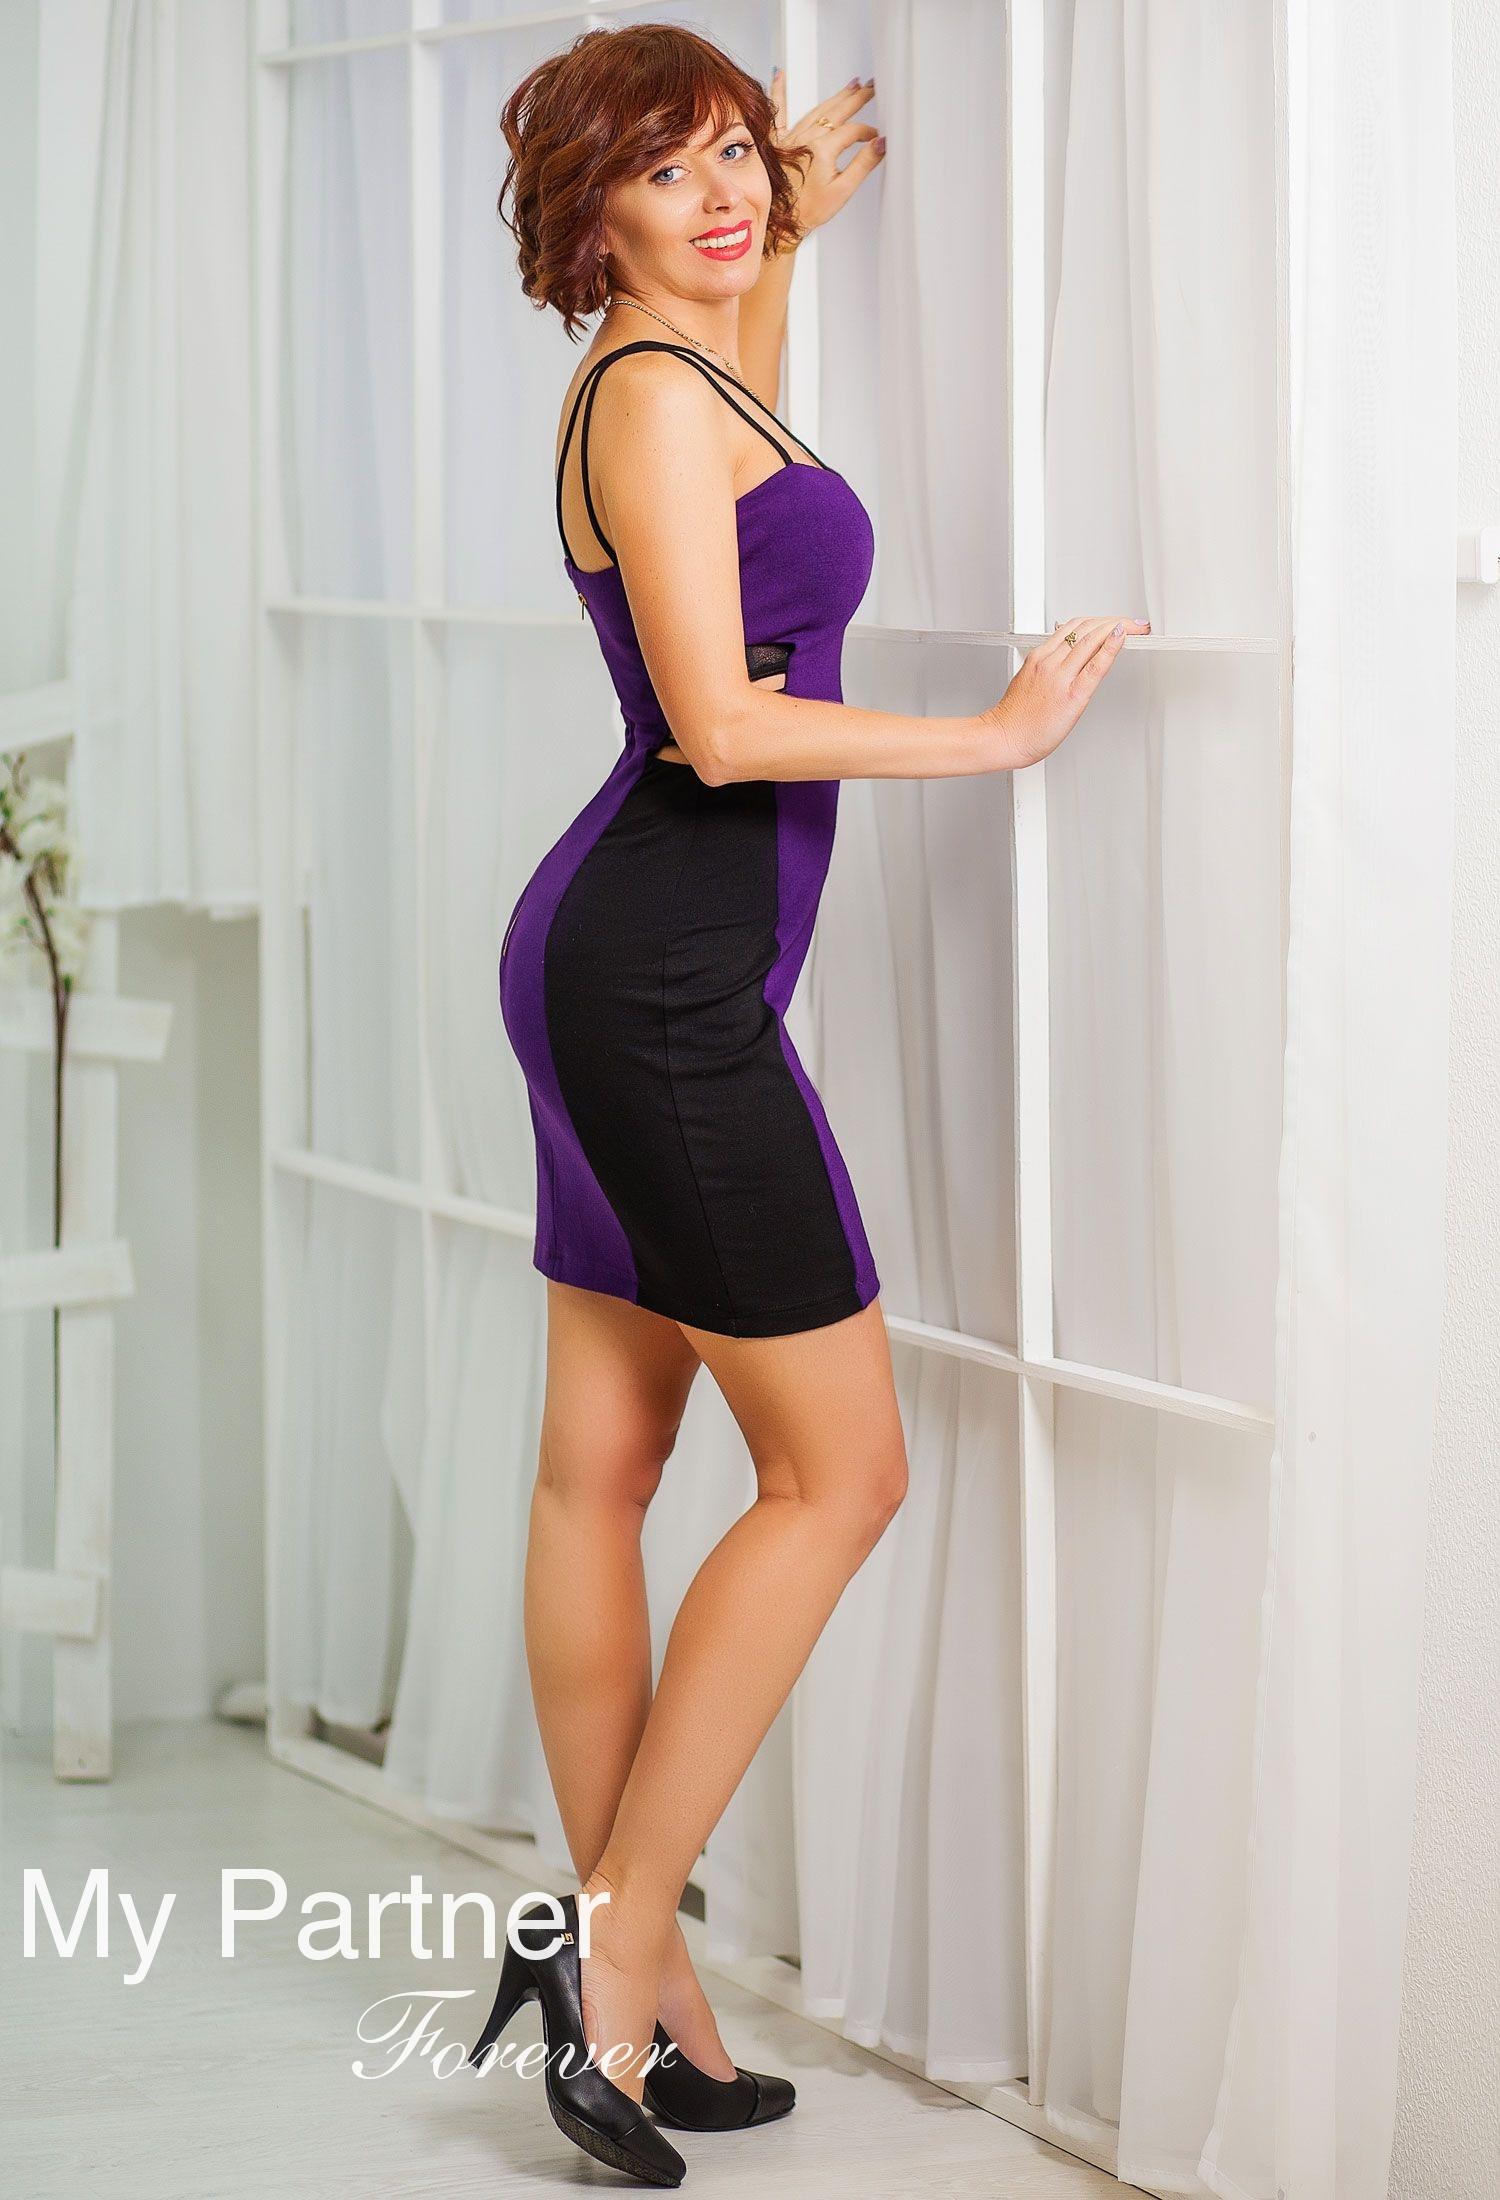 Russian Women Svetlana K Starobelsk  Dating Agency Ua Ladys